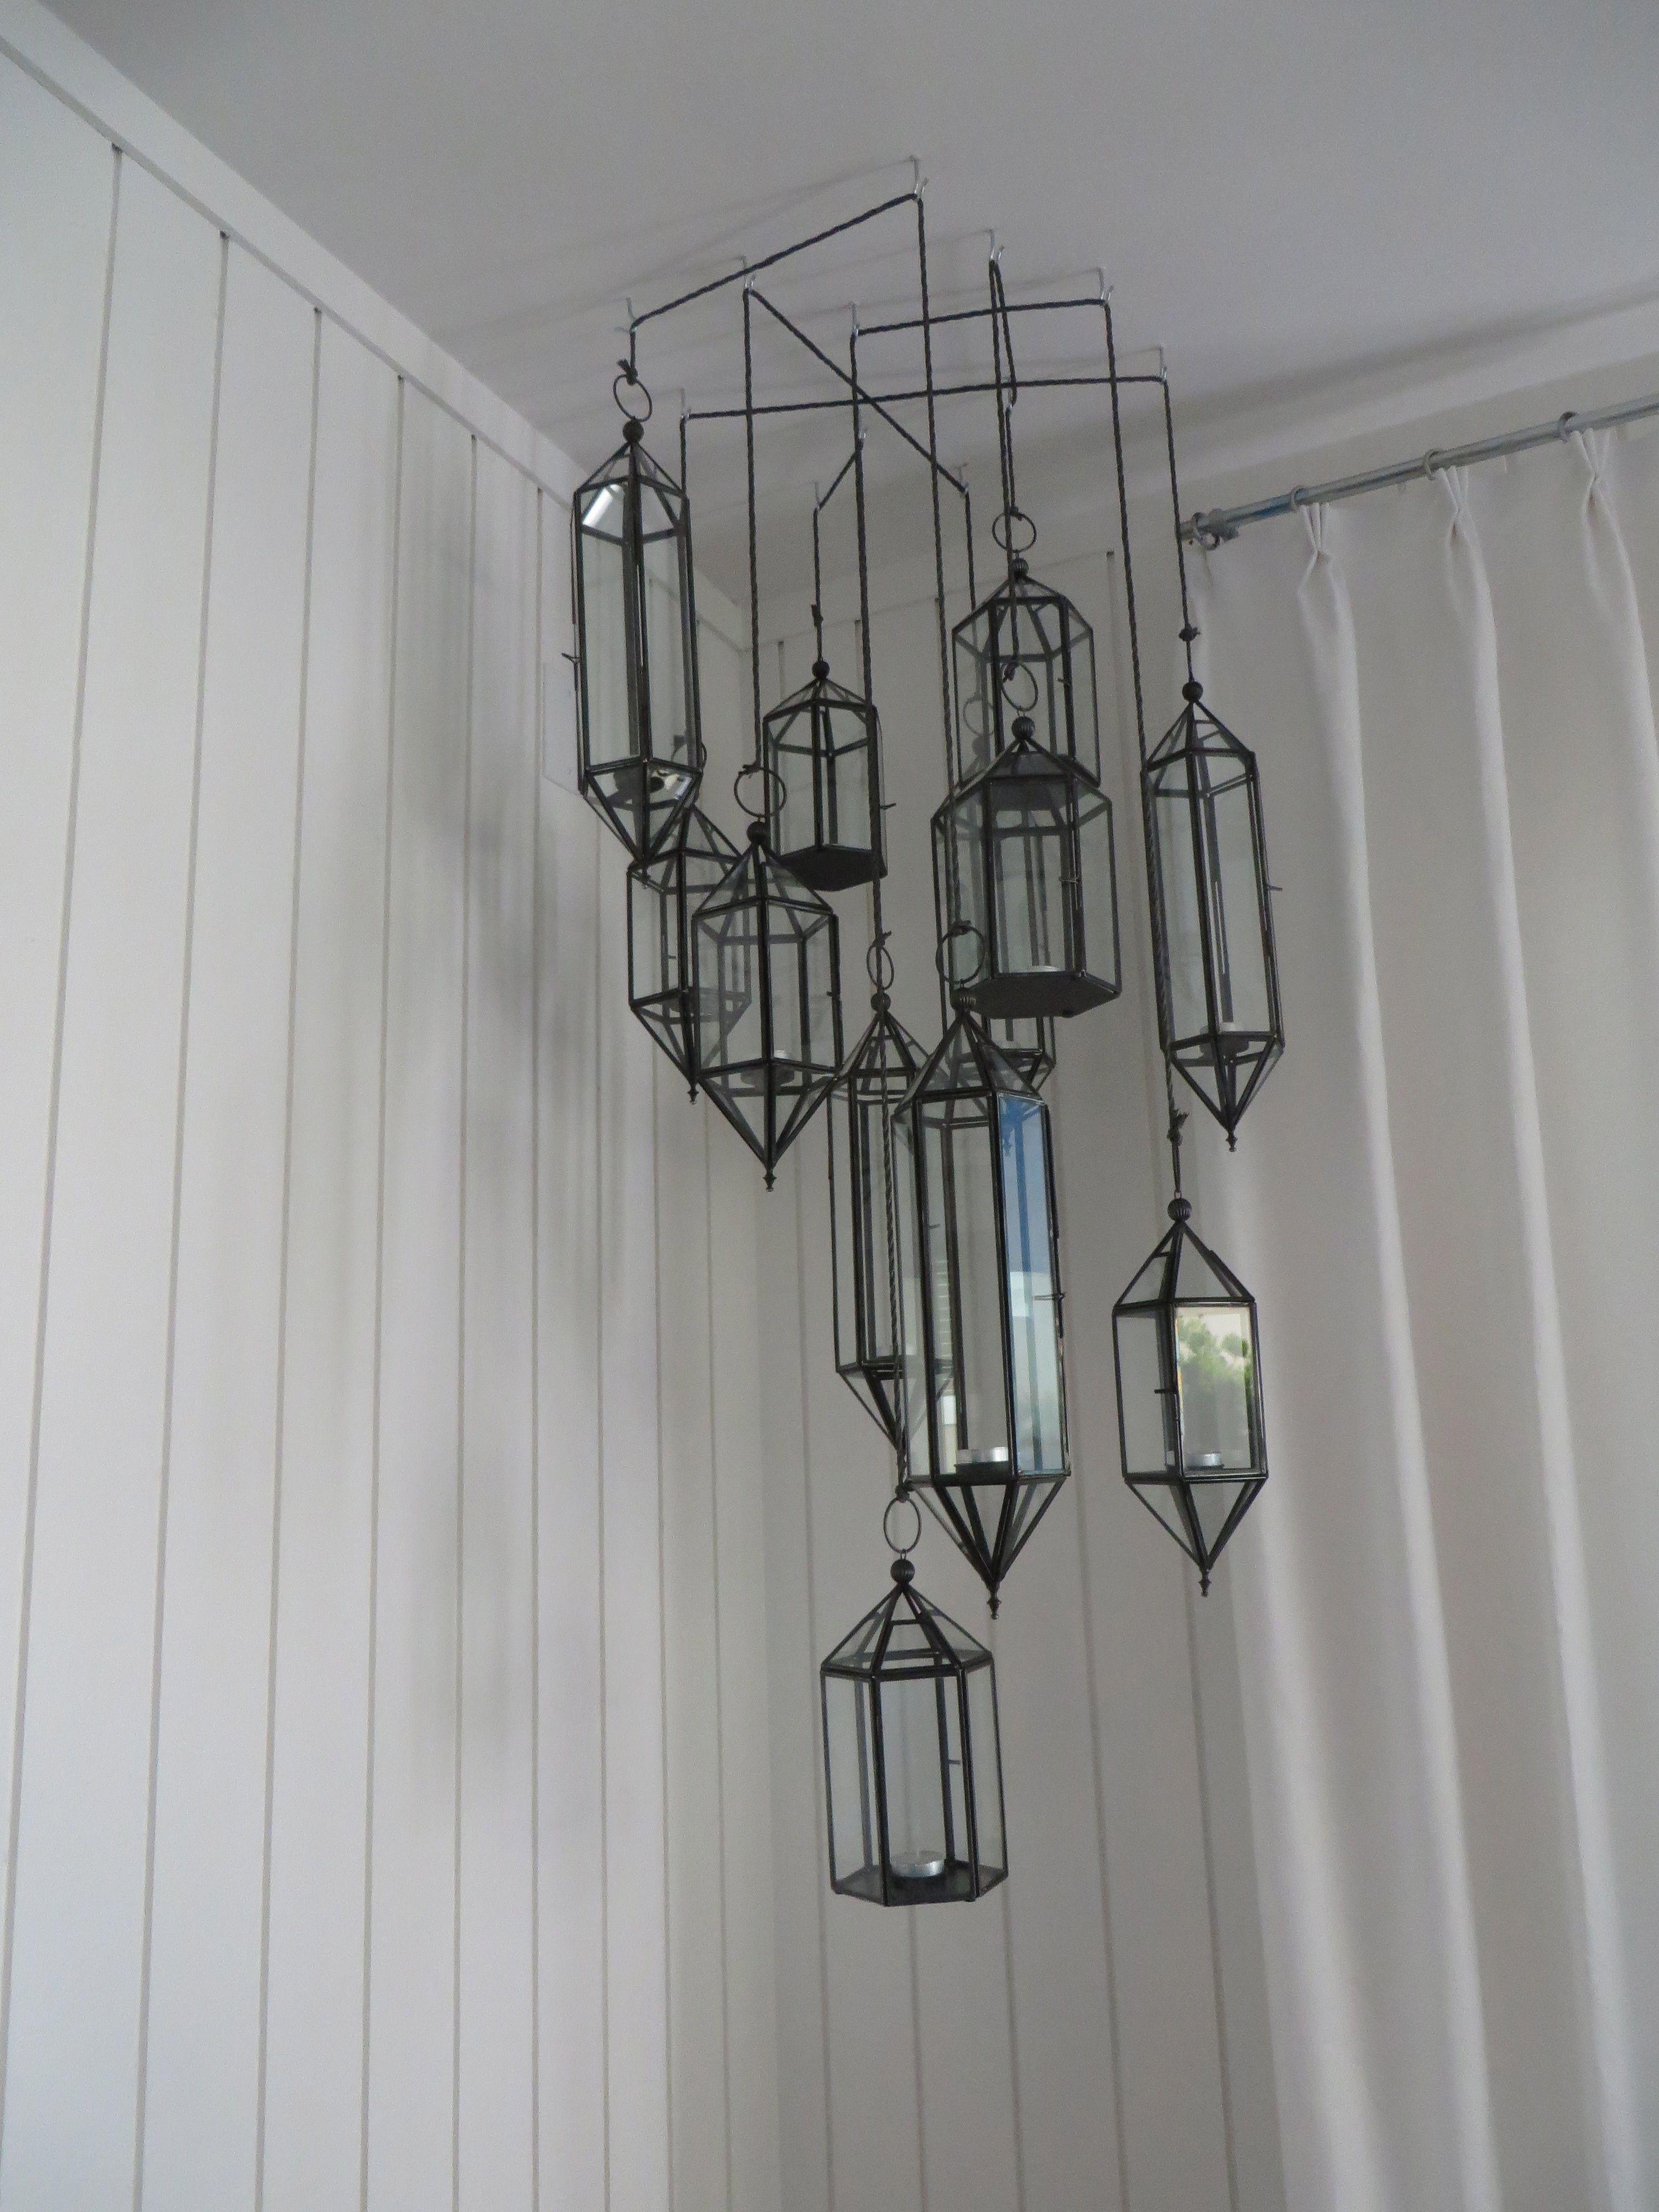 Lukas Machnik Diy Home Design Architecture Pinterest Lights  # Muebles Modulares Lukar